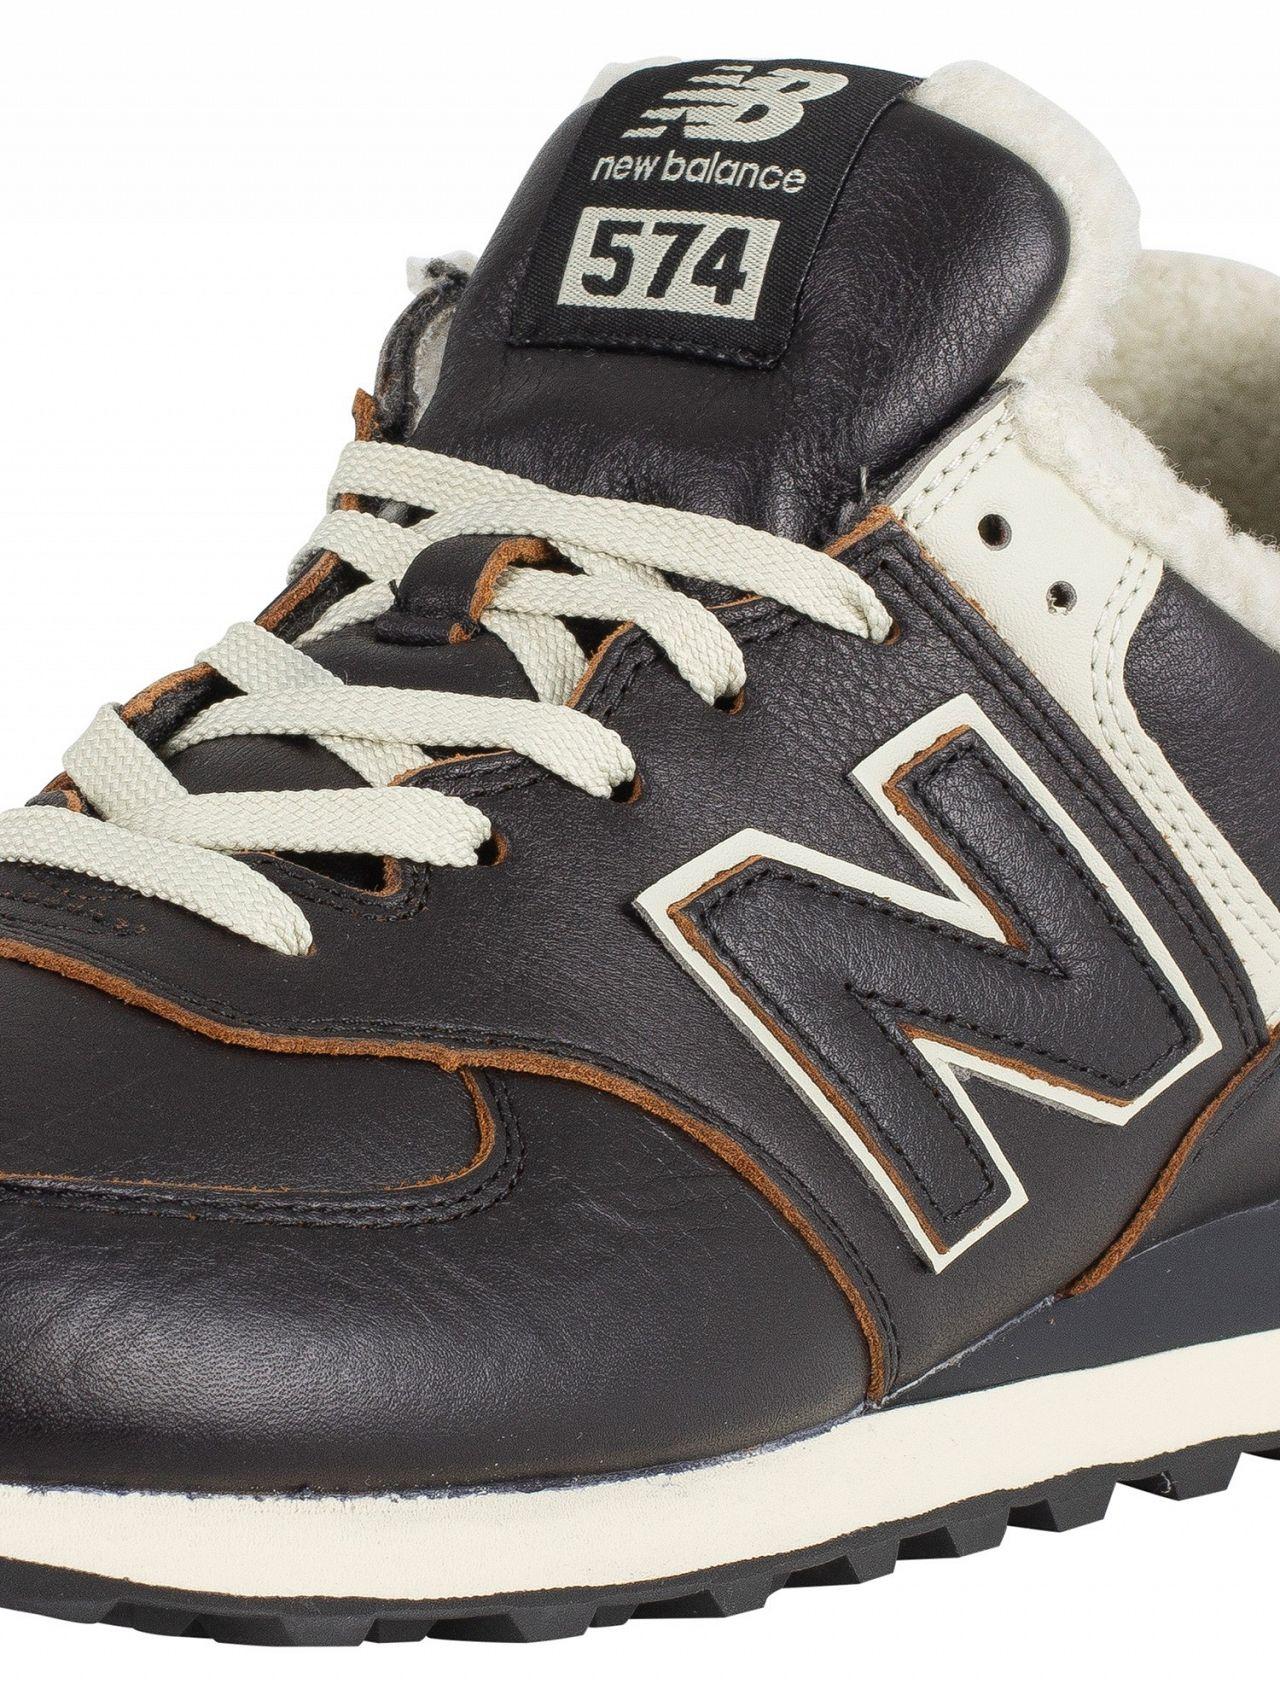 35e23ec684e New Balance Black/White Munsell 574 Leather Sherpa Trainers